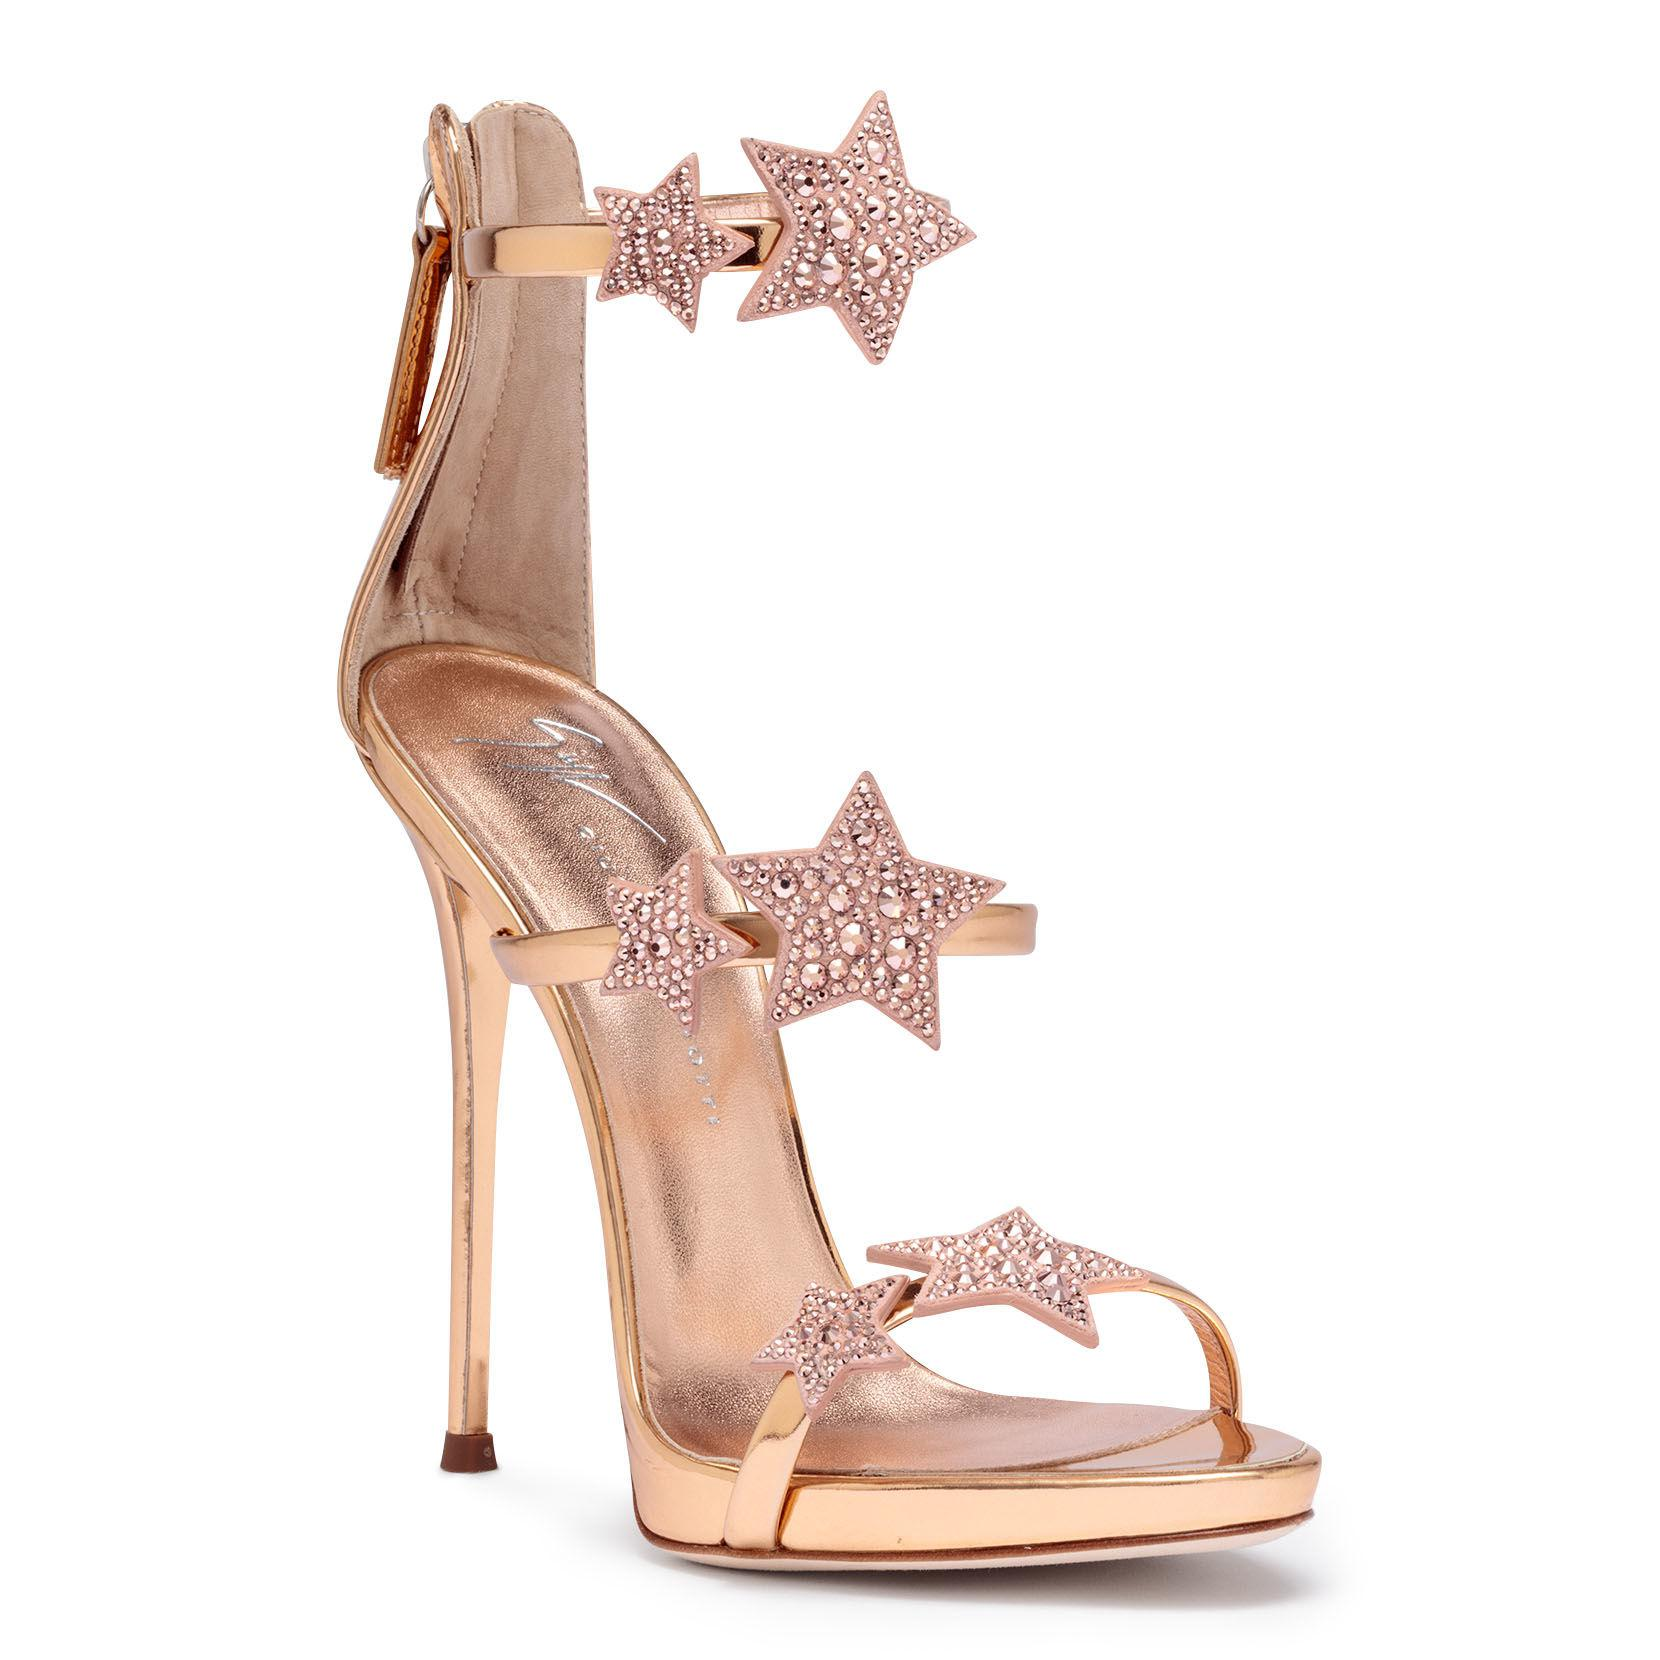 ba091f72ca5f4 Giuseppe Zanotti Harmony Star 120 Rose Gold Leather Sandals in Pink ...